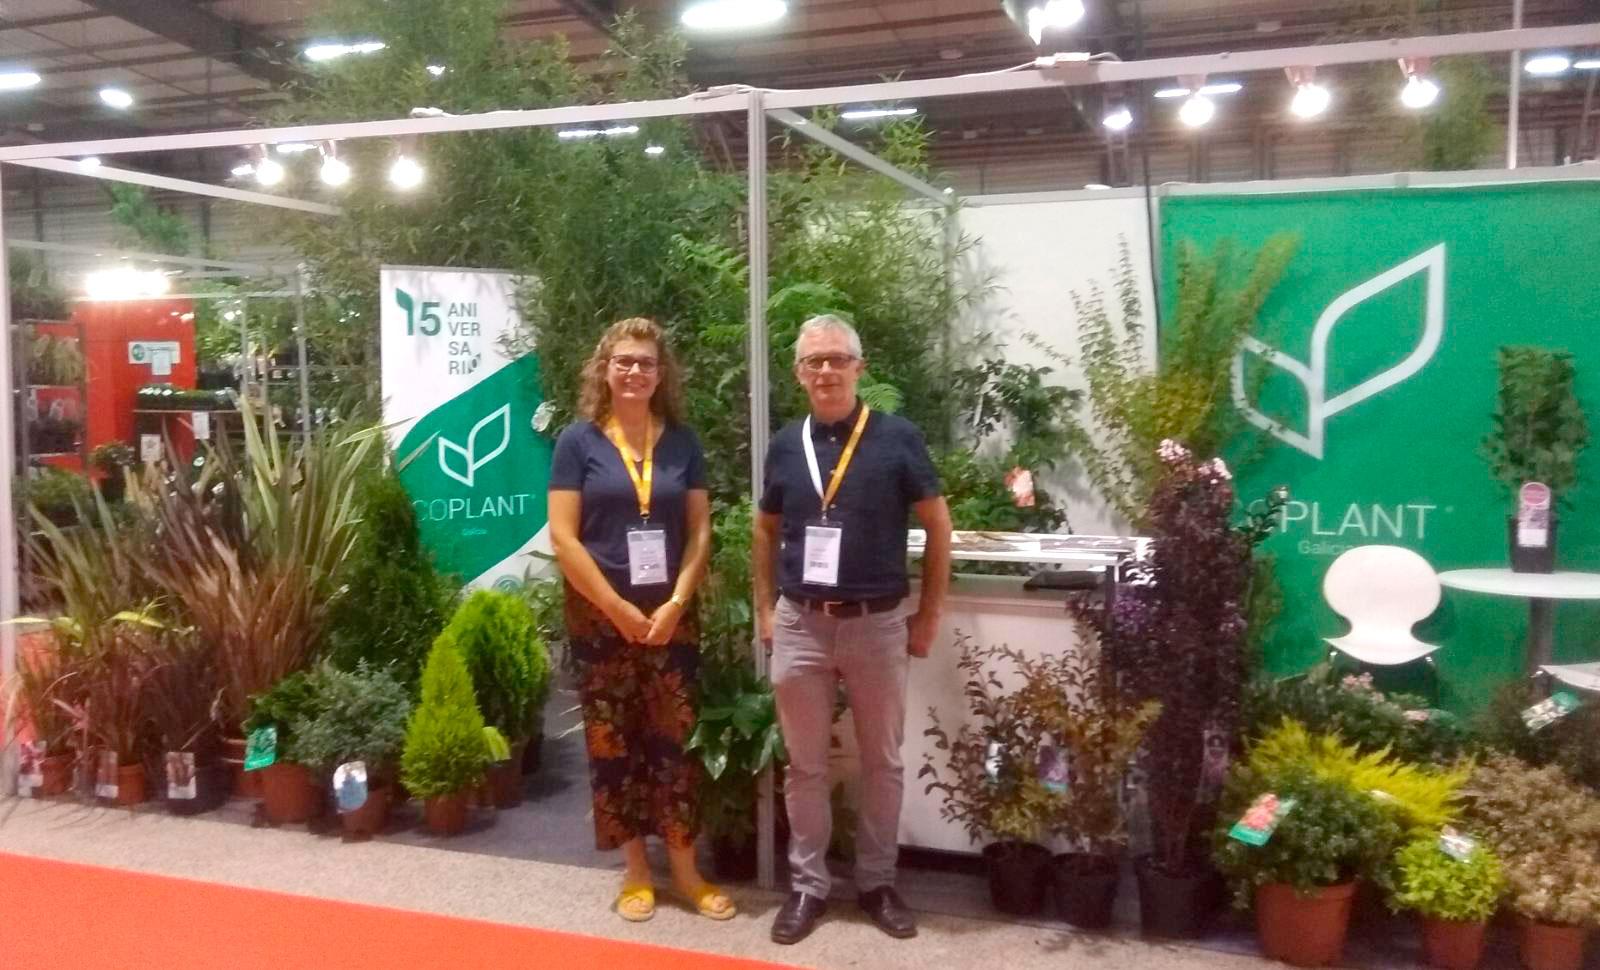 Nuestros representantes en Nantes, Caroline da Silva y Jon Zabaleta, recibieron a un gran número de clientes en el Salon dun Végétal